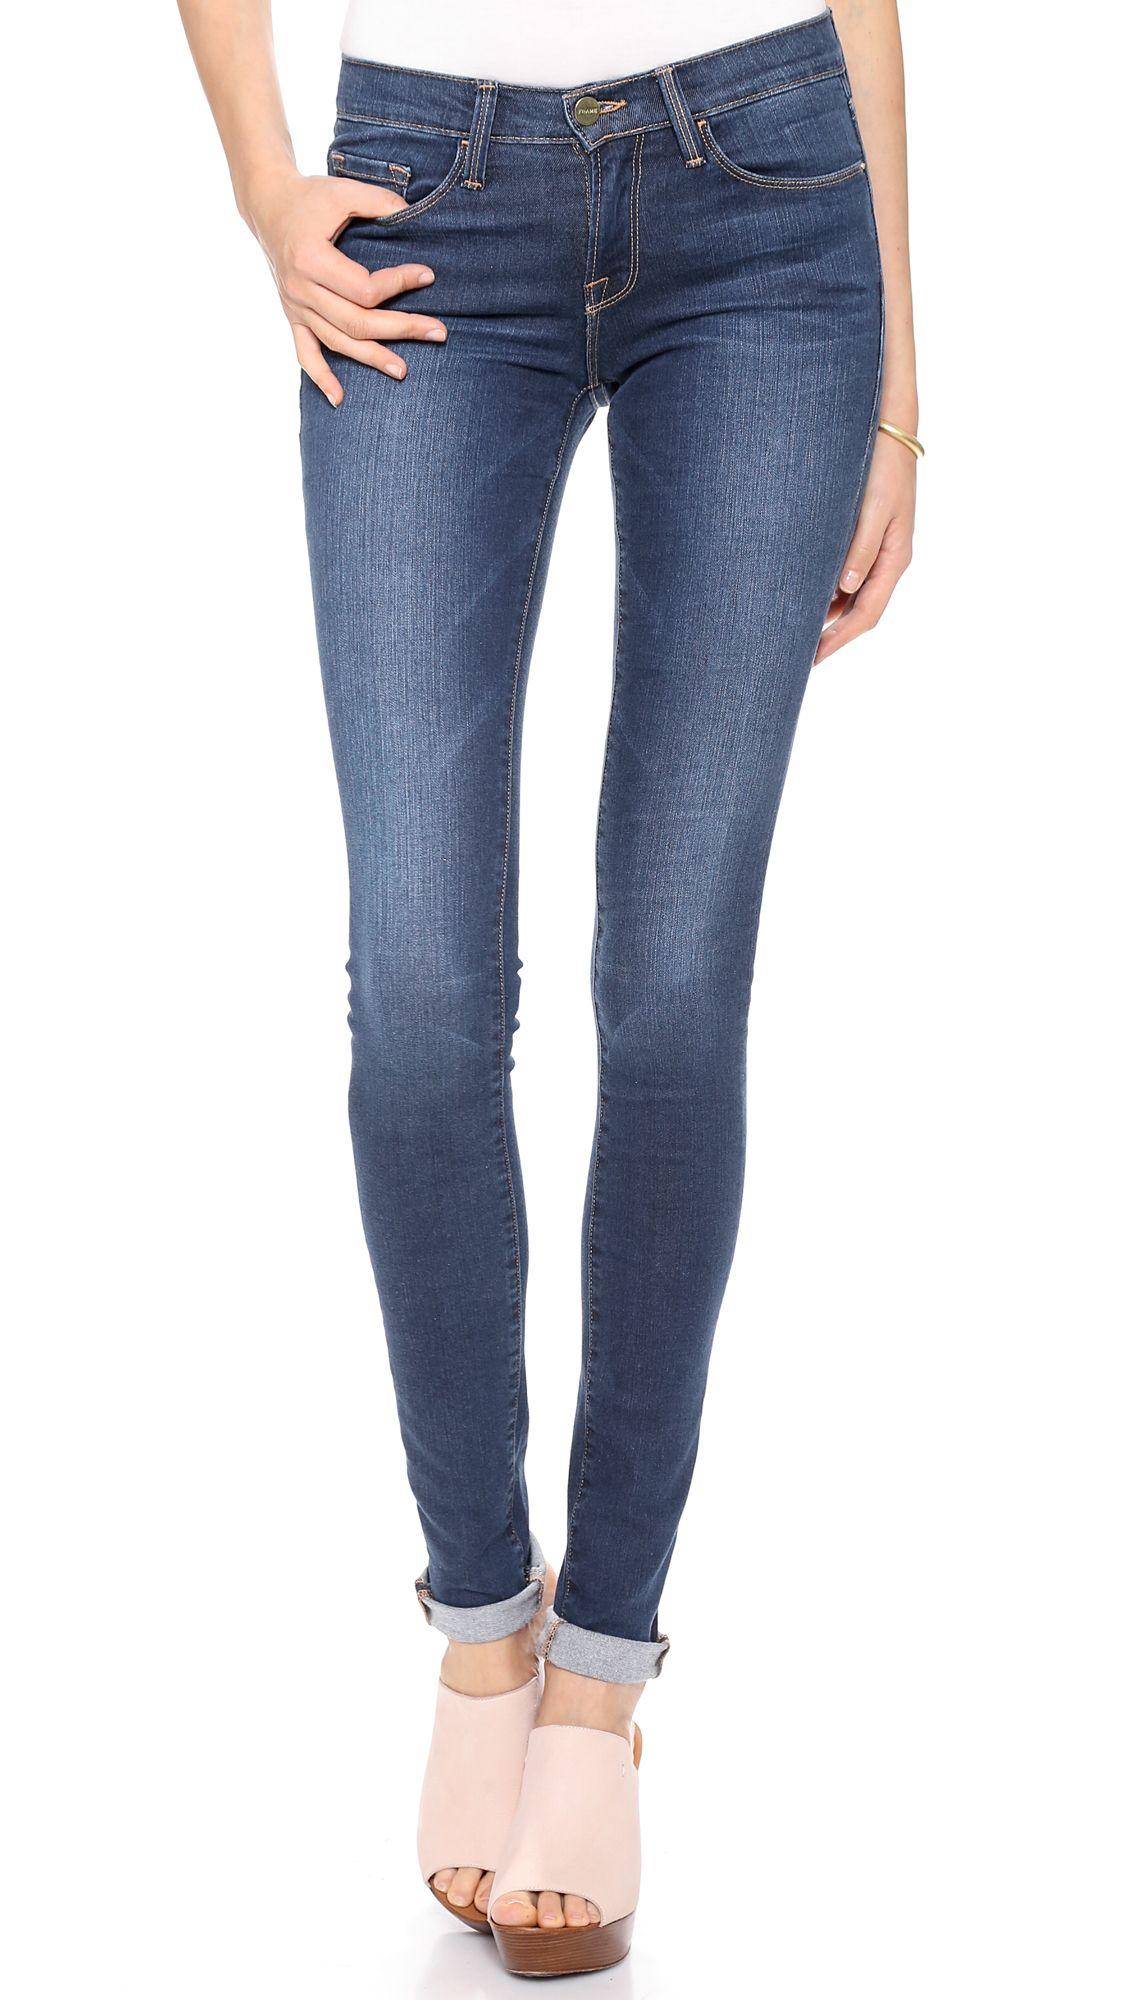 Forever Karlie Tall Skinny Jeans | C L O T H E | Pinterest | Jeans ...